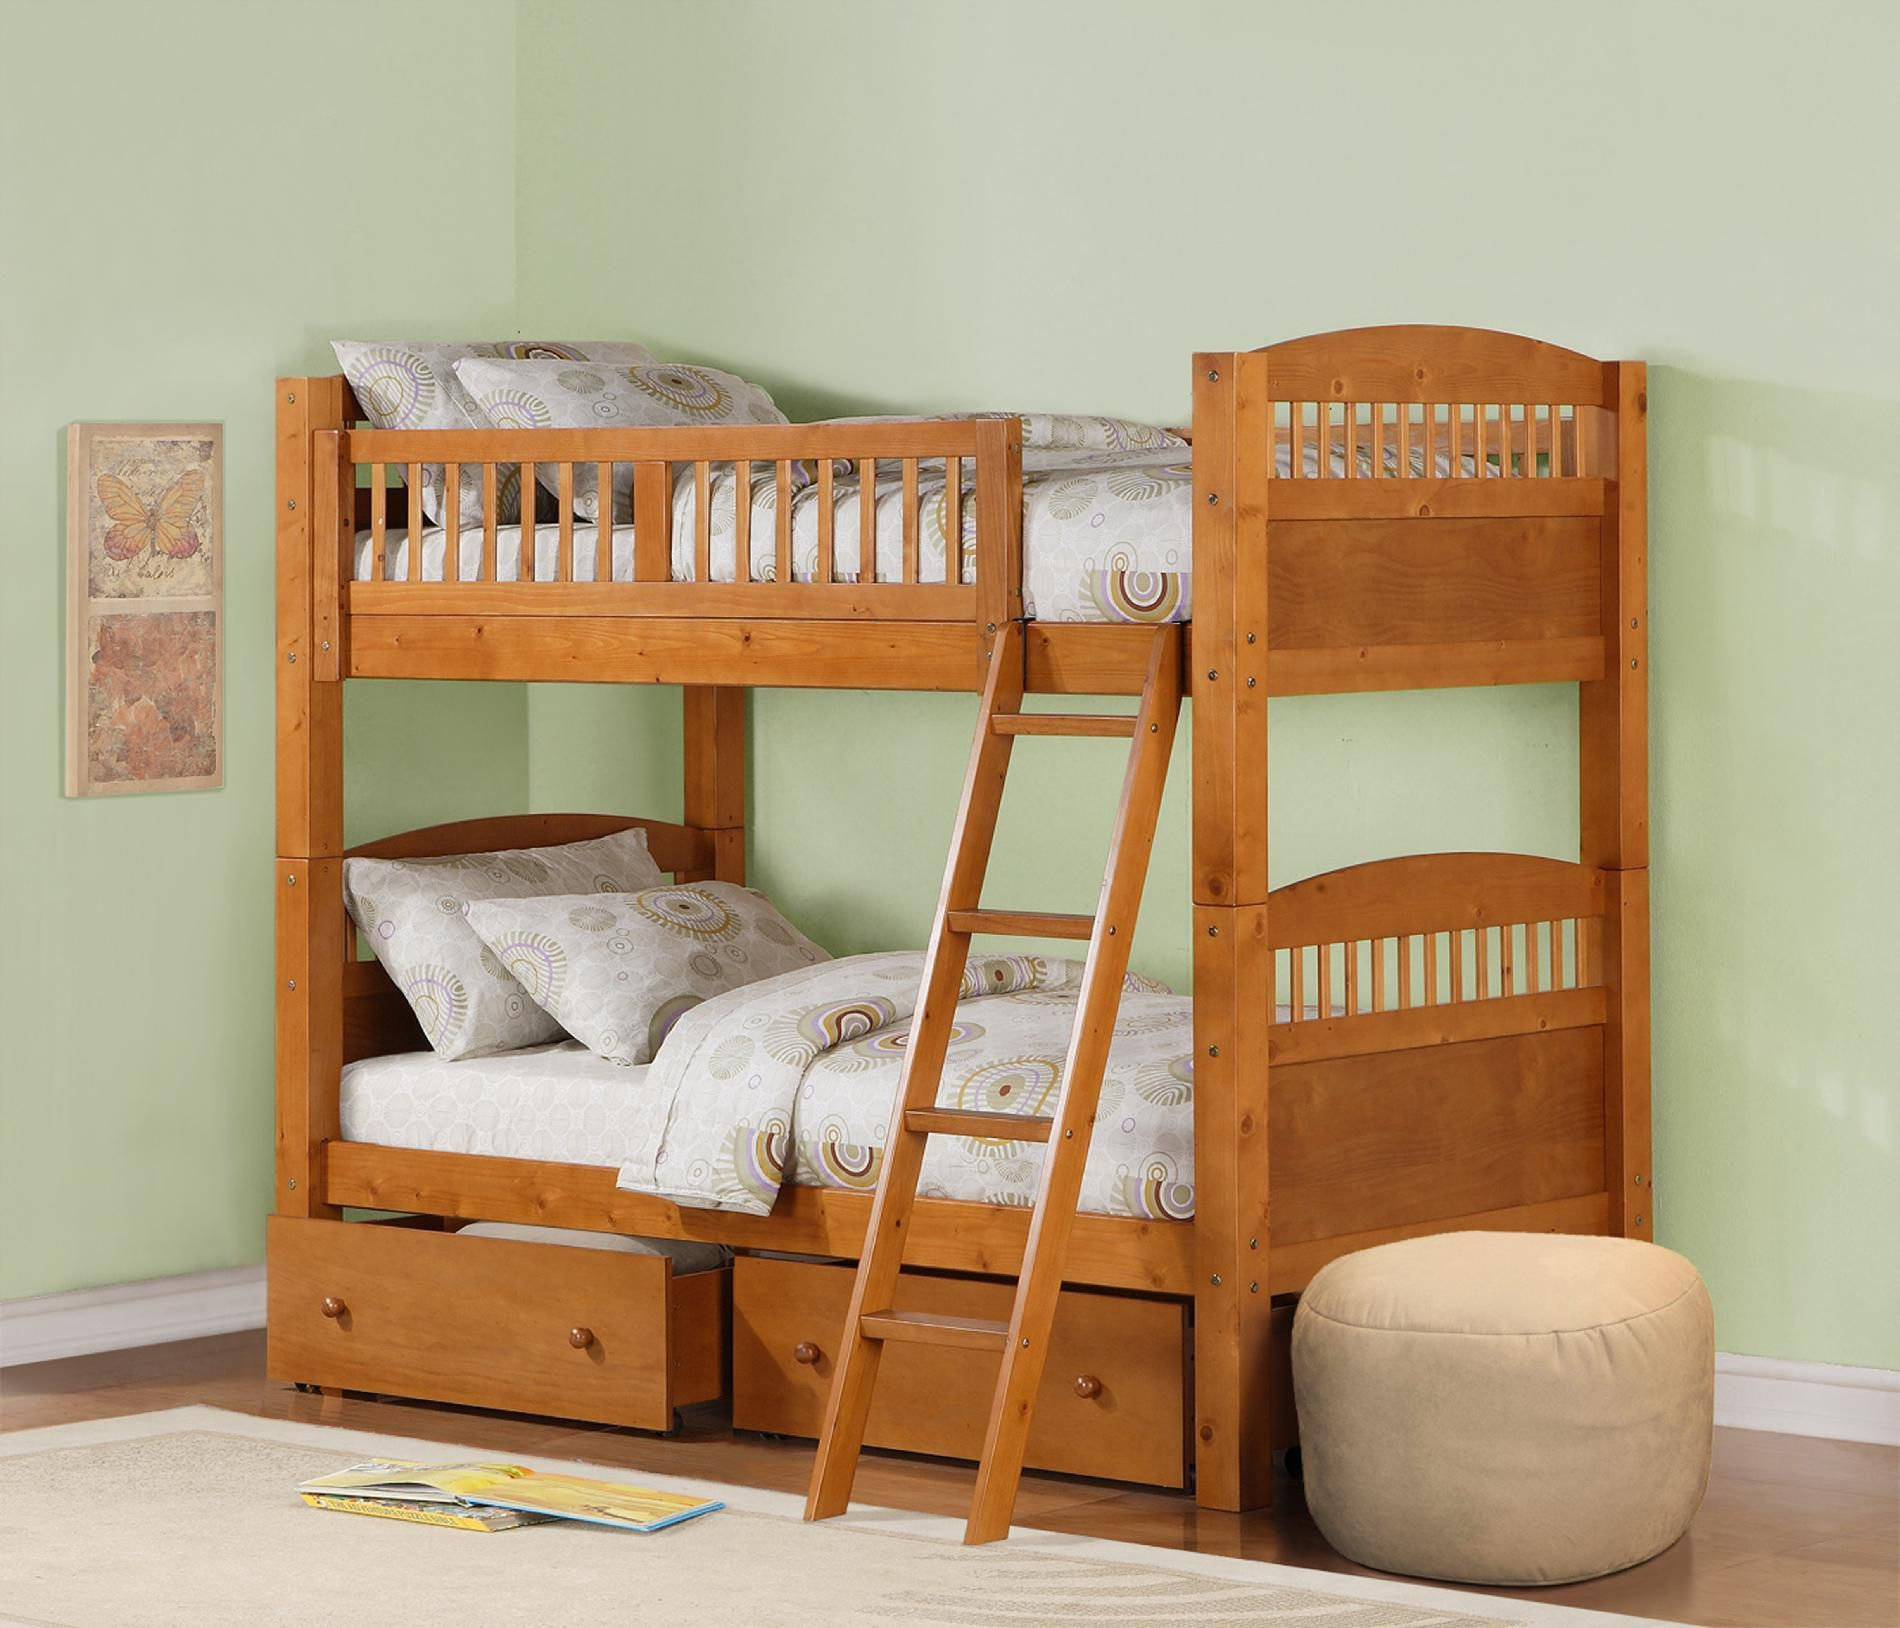 Pine Bunk Bed: Sleep Well with Sears | Kid bedroom ideas | Pinterest